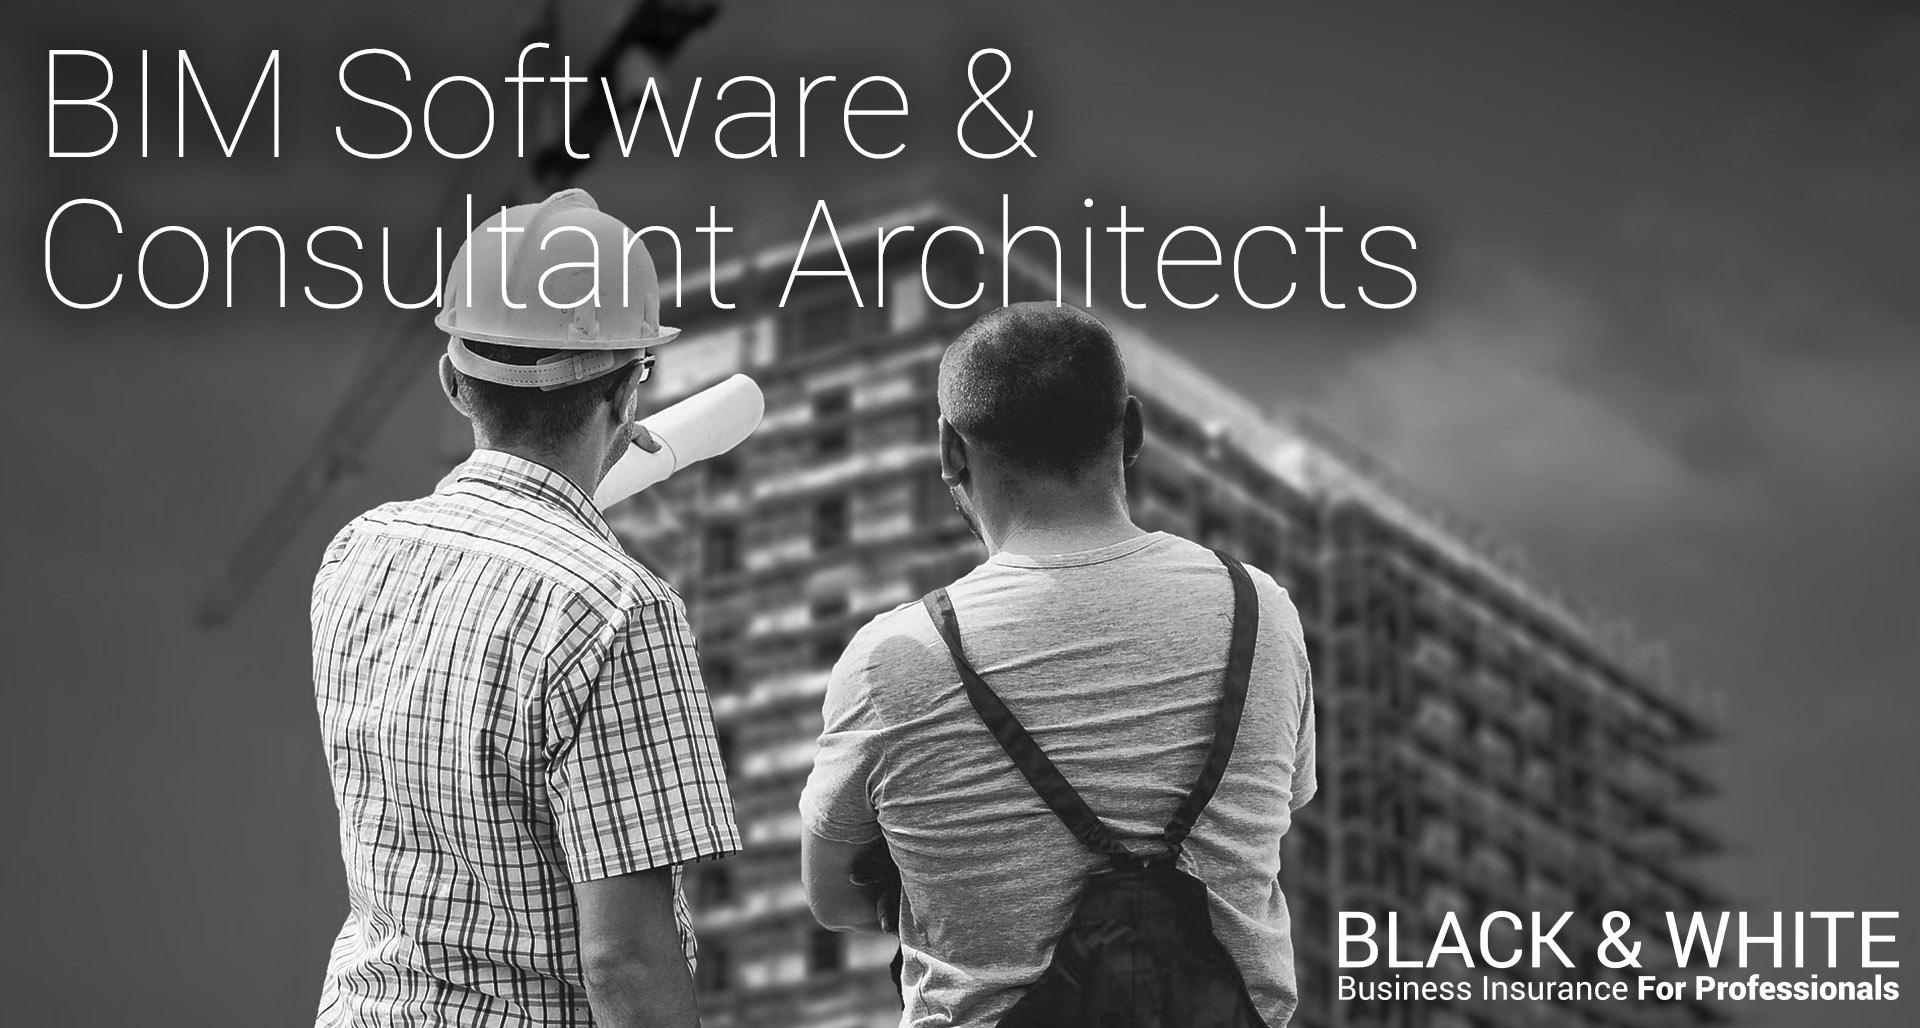 BIM Software | Black and White